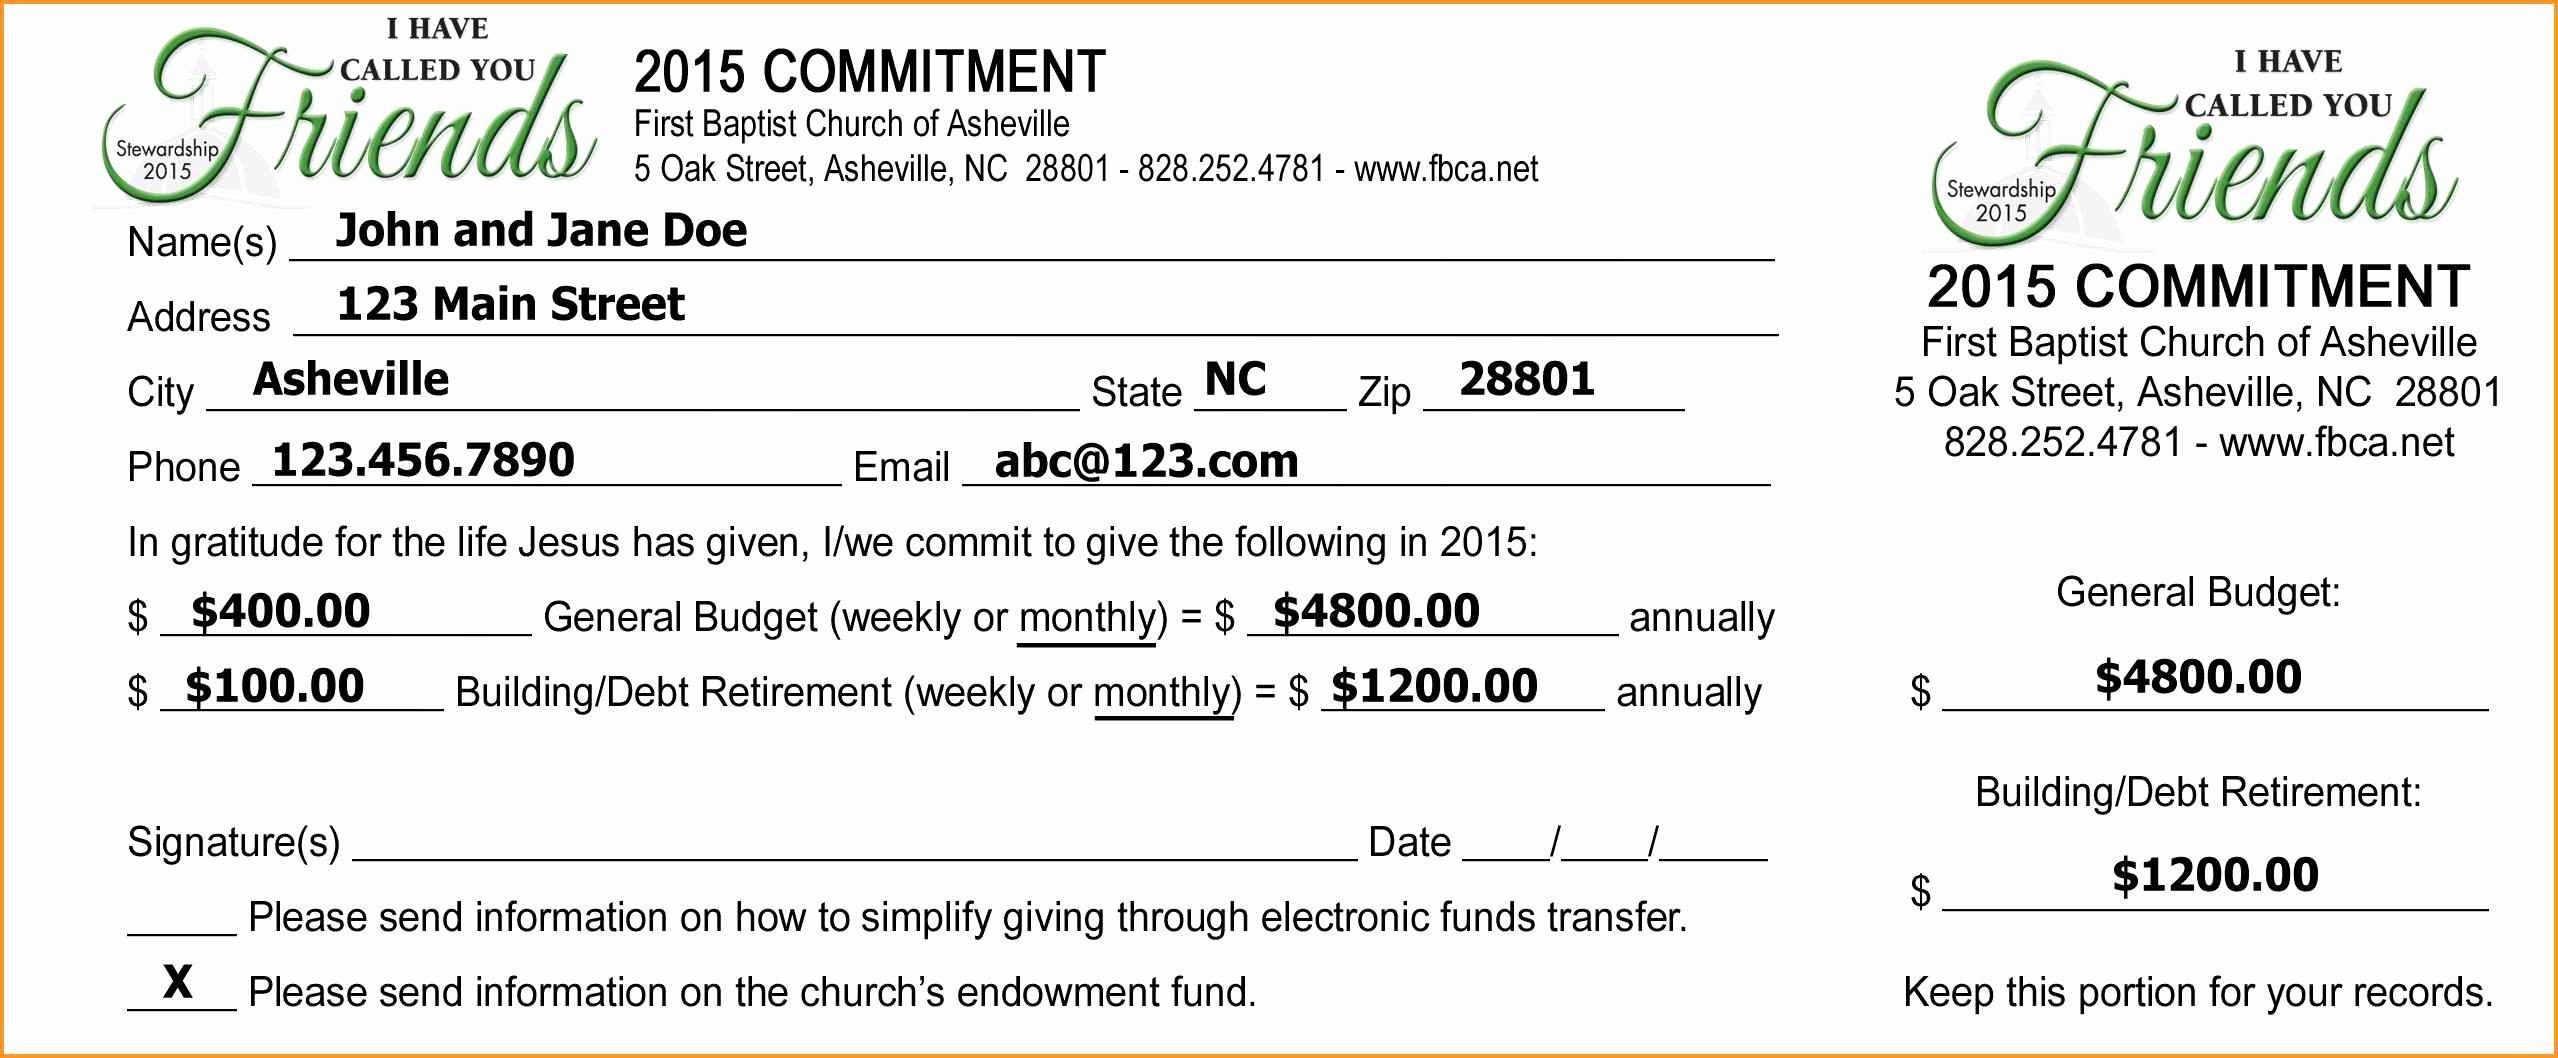 Non Profit Donation Card Template Inspirational Free Pledge Card Template